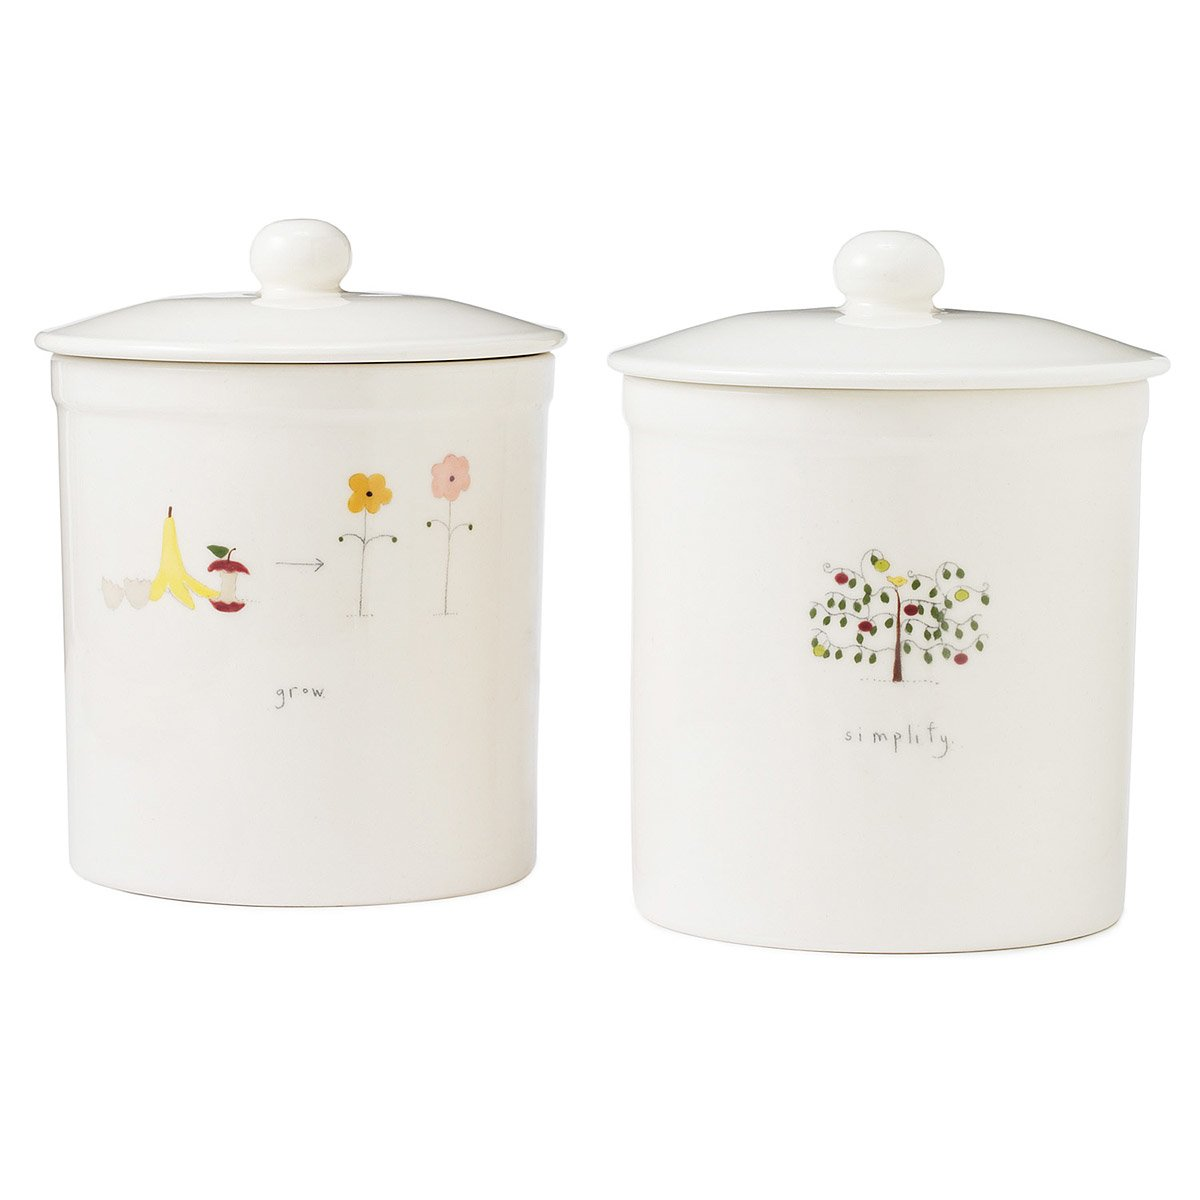 Countertop Compost : Ceramic Countertop Compost Container Compost Bin, Container, Crock ...